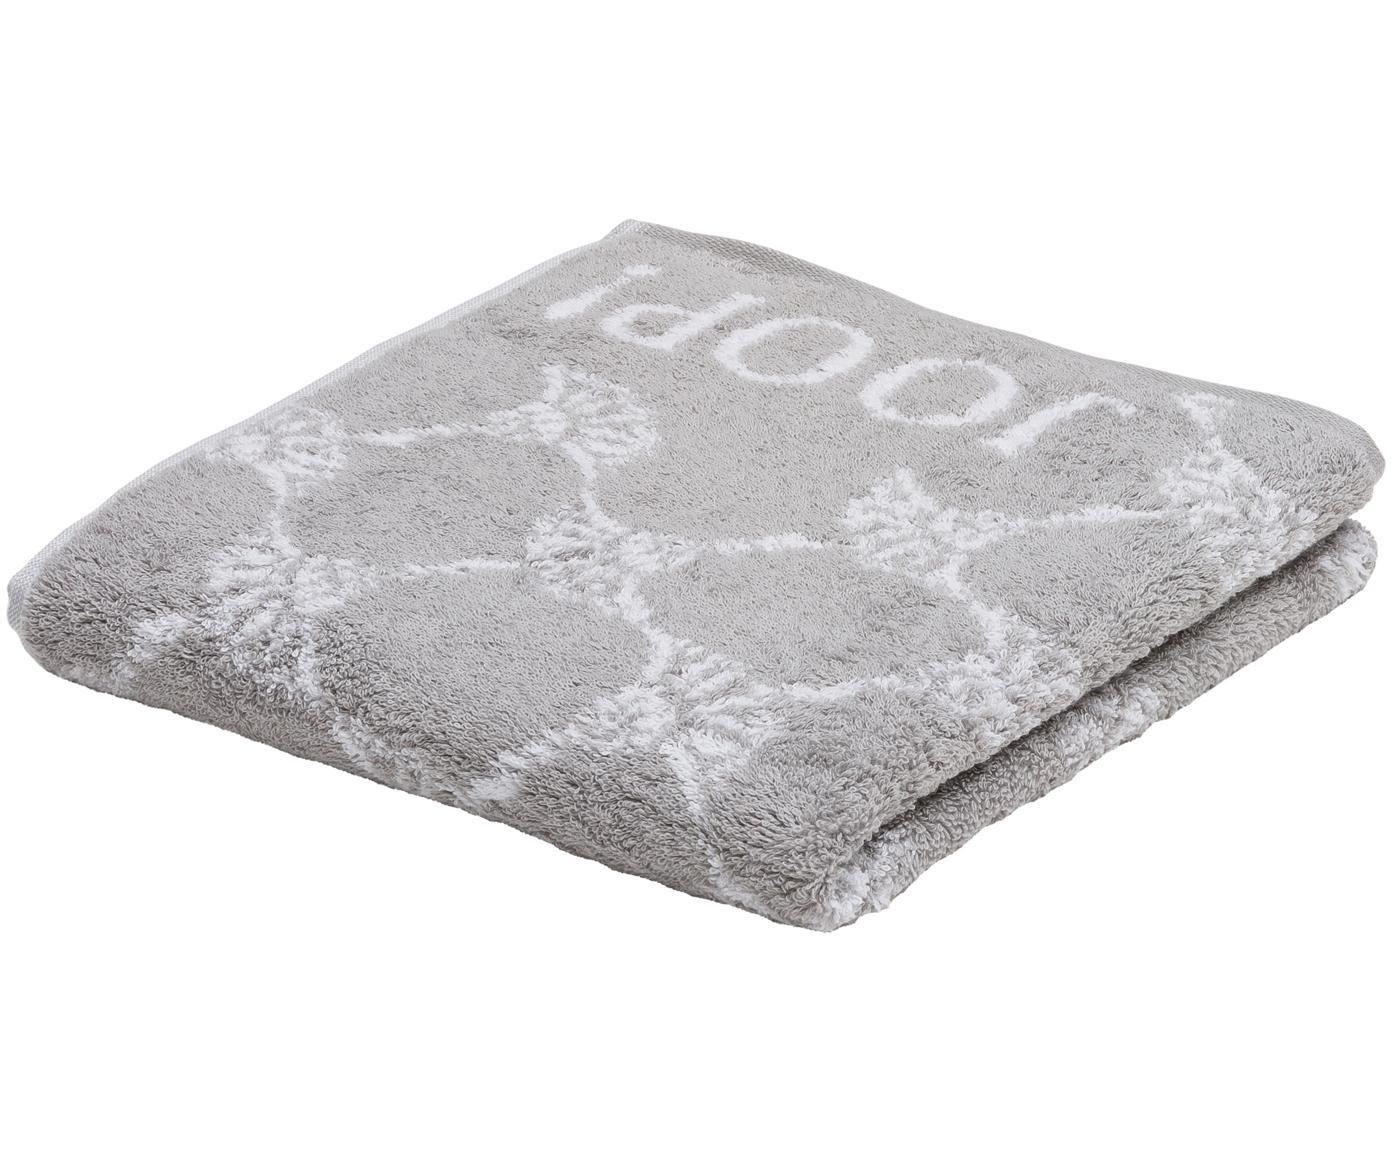 Toalla Classic Cornflower, 100%algodón (rizado) Gramaje medio, 536g/m², Gris plateado, blanco, Toalla de manos